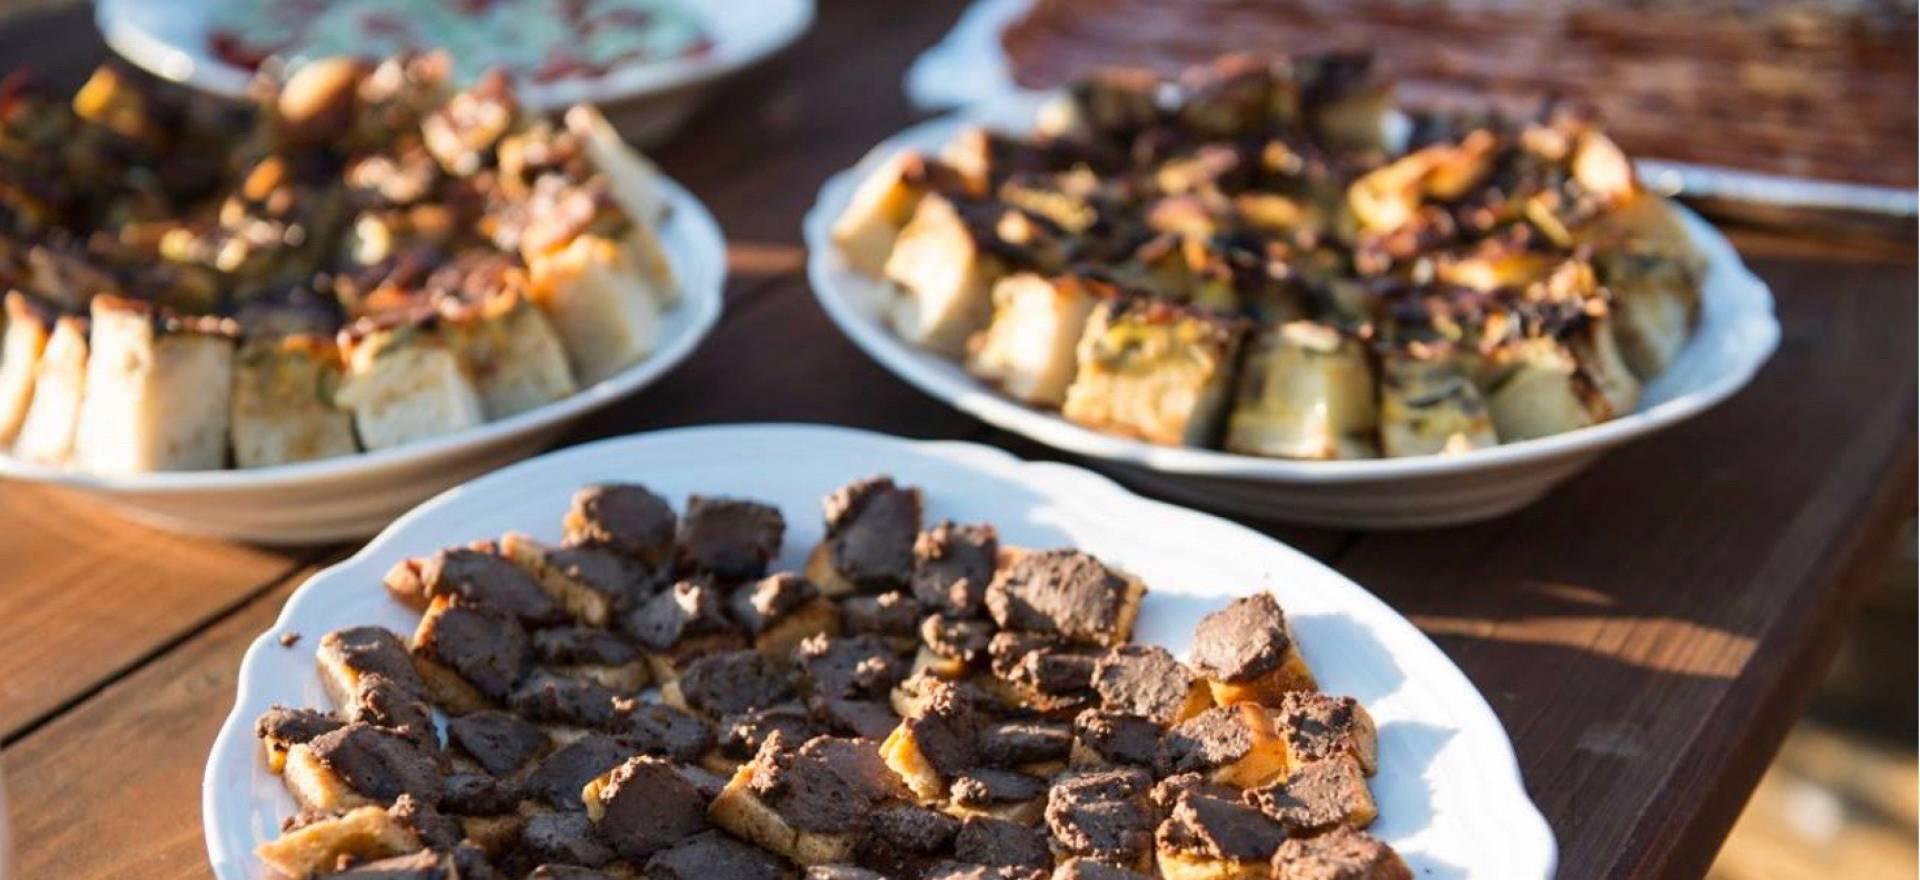 Agriturismo Toscana Sorprendente agriturismo vicino a Pienza con ristorante